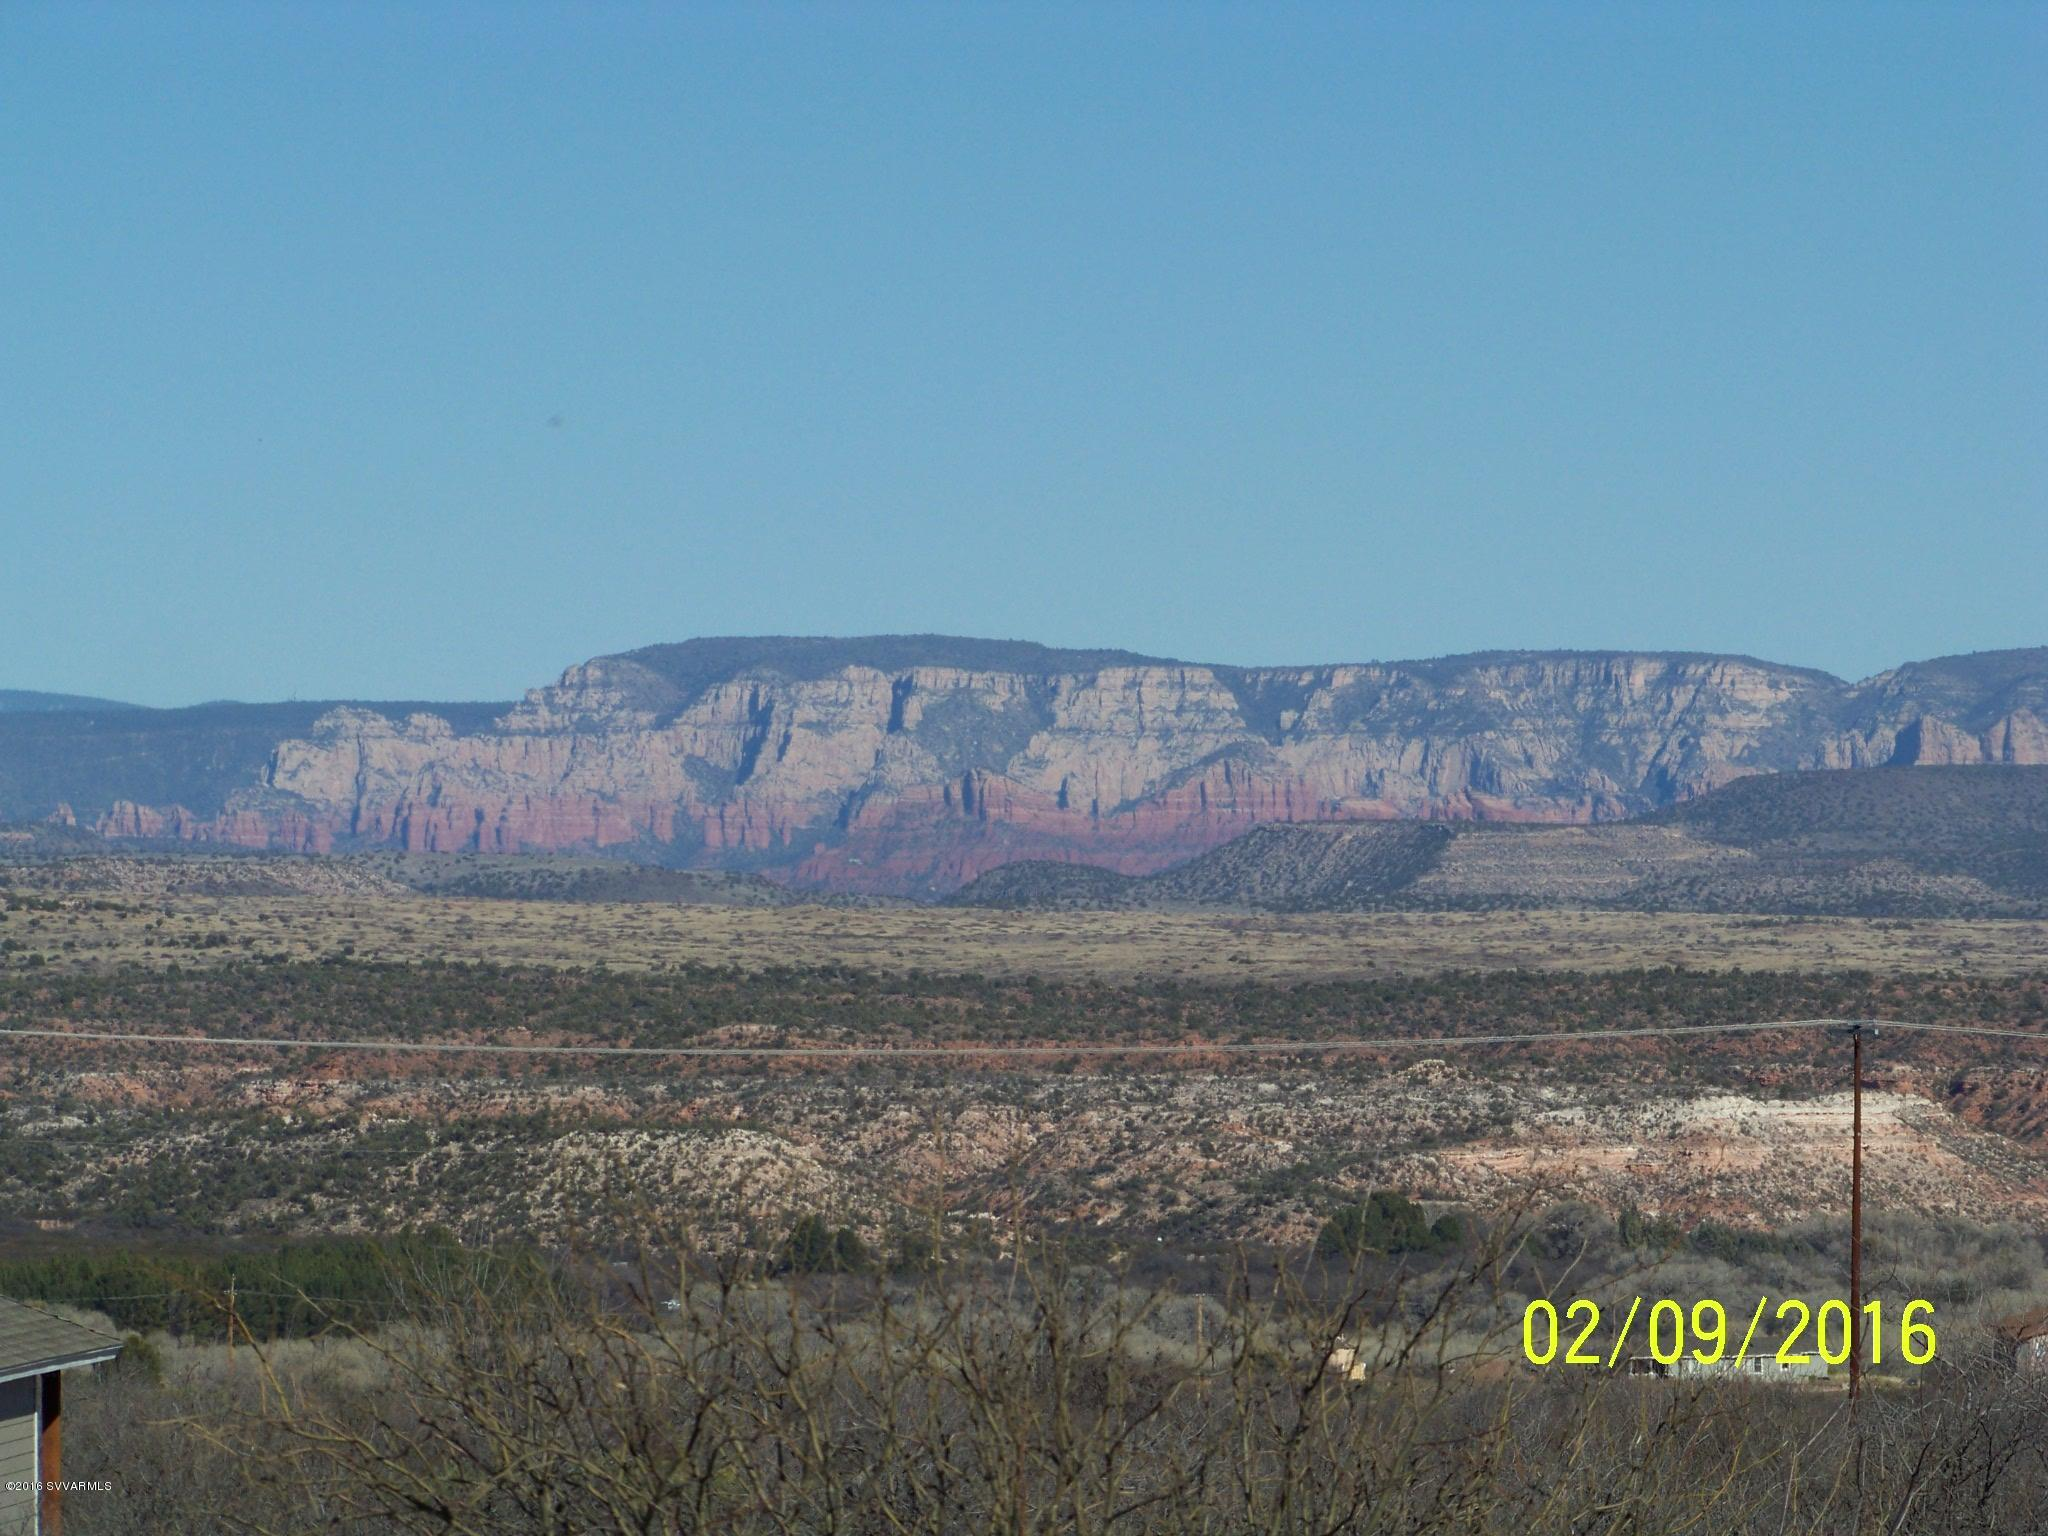 2081 Crossroads Clarkdale, AZ 86324